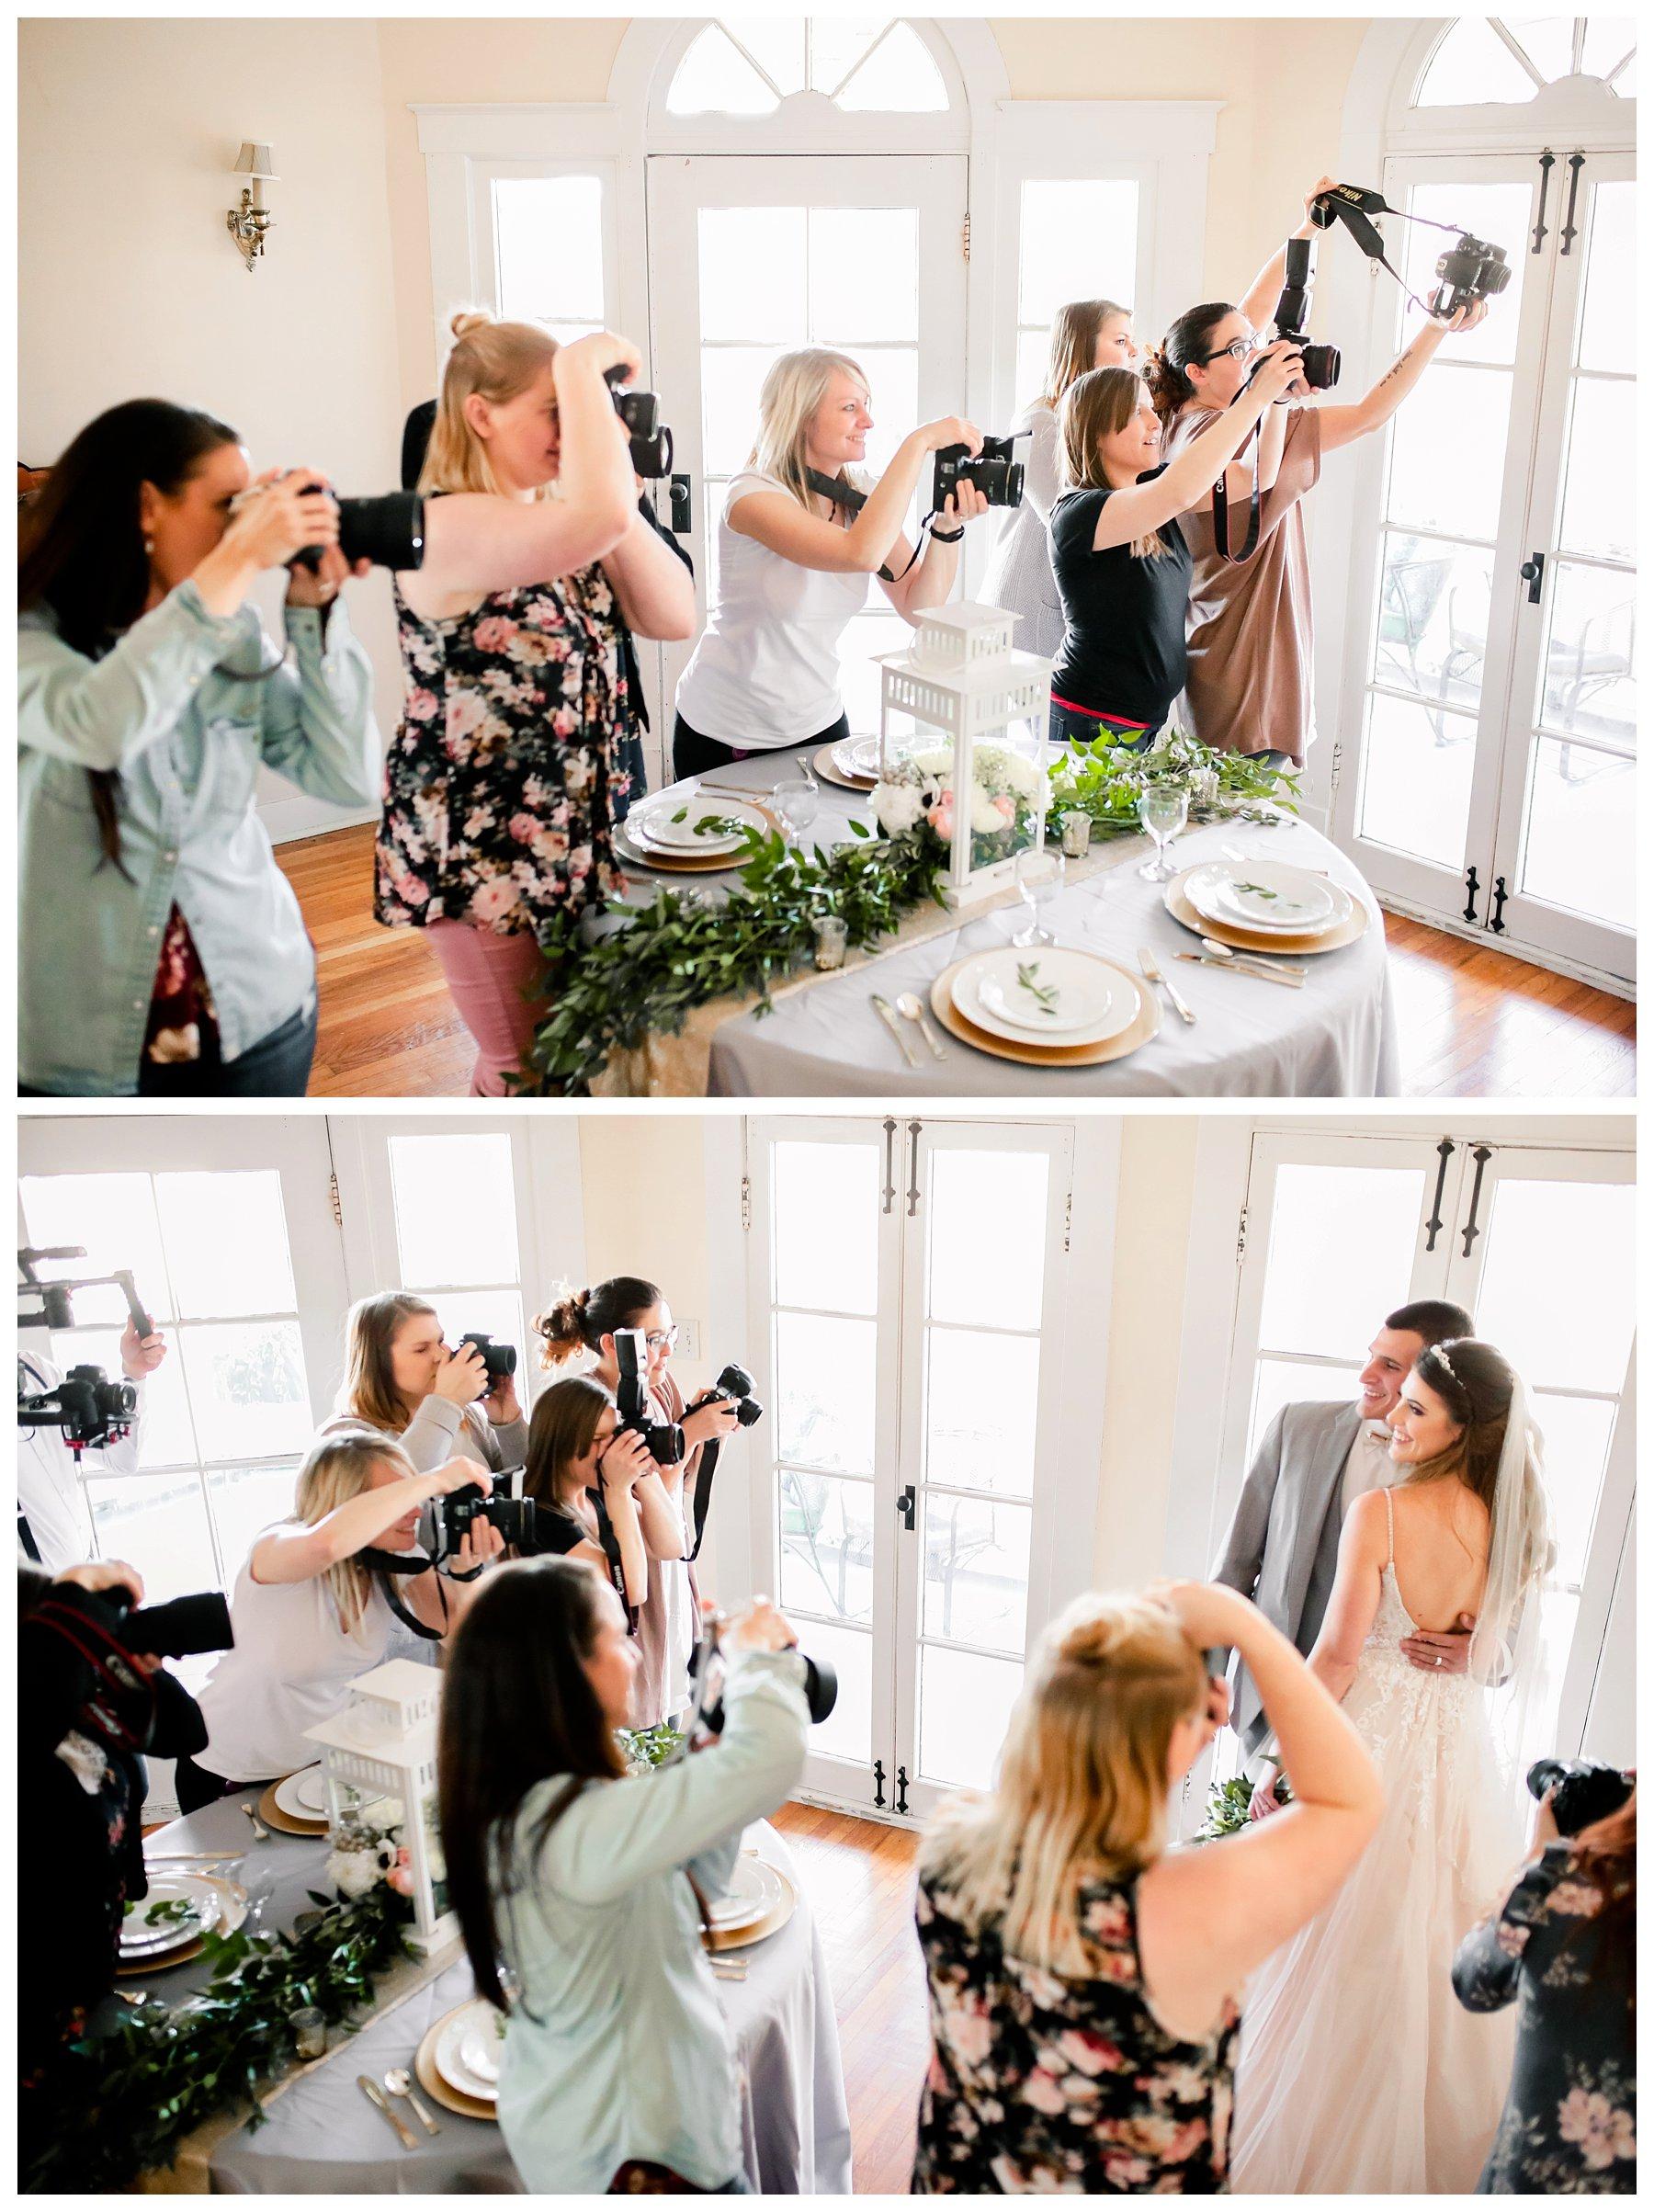 photographer_wedding_saint_louis_Kansas_City_Photography_Videography_workshop_training_styled_engagement_Lake_Ozark_KC_MO_STL_Rolla_Hermann_Saint_James_0370.jpg